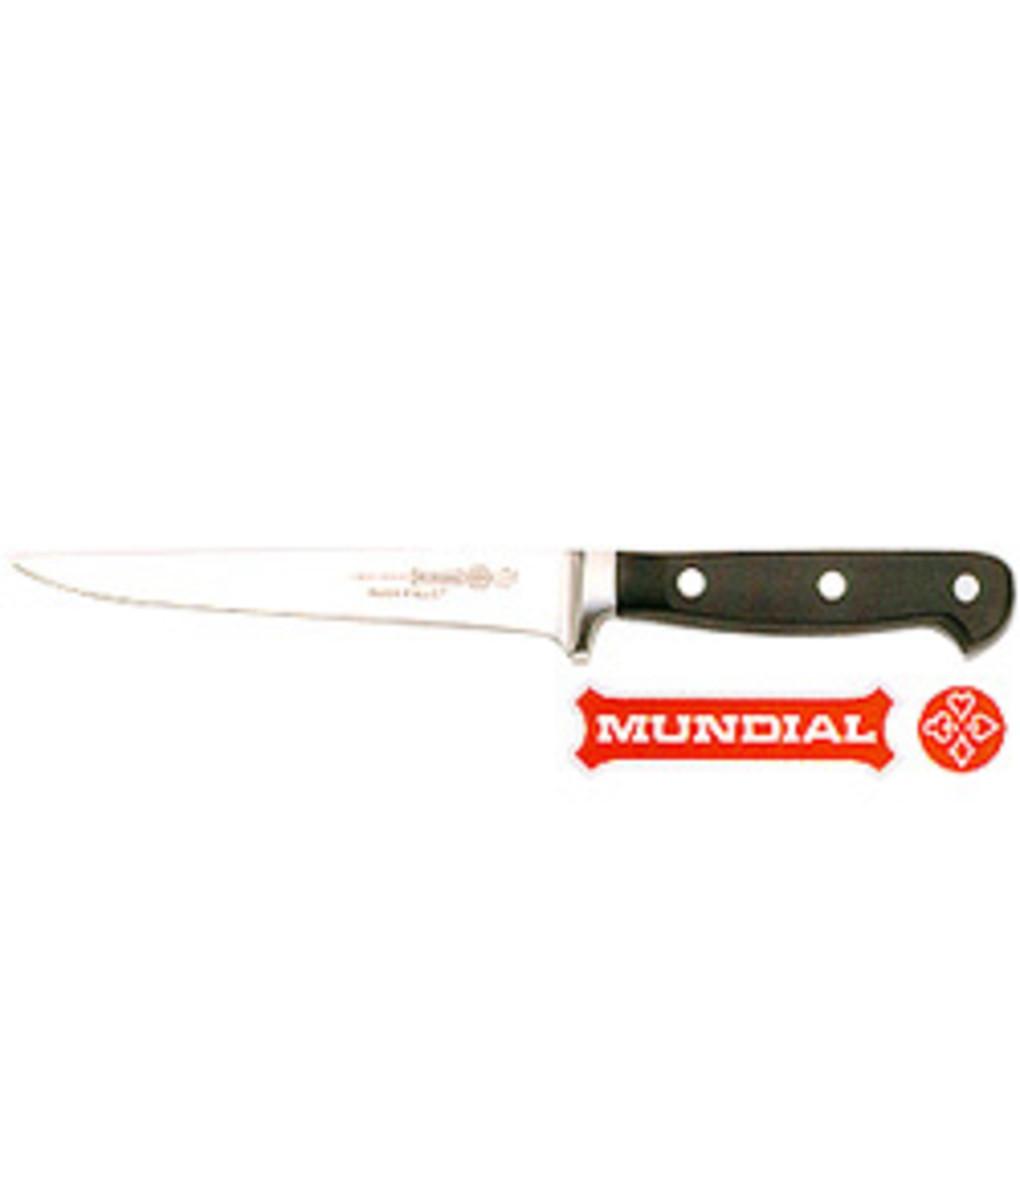 Mundial Boning Knife Stiff 15cm